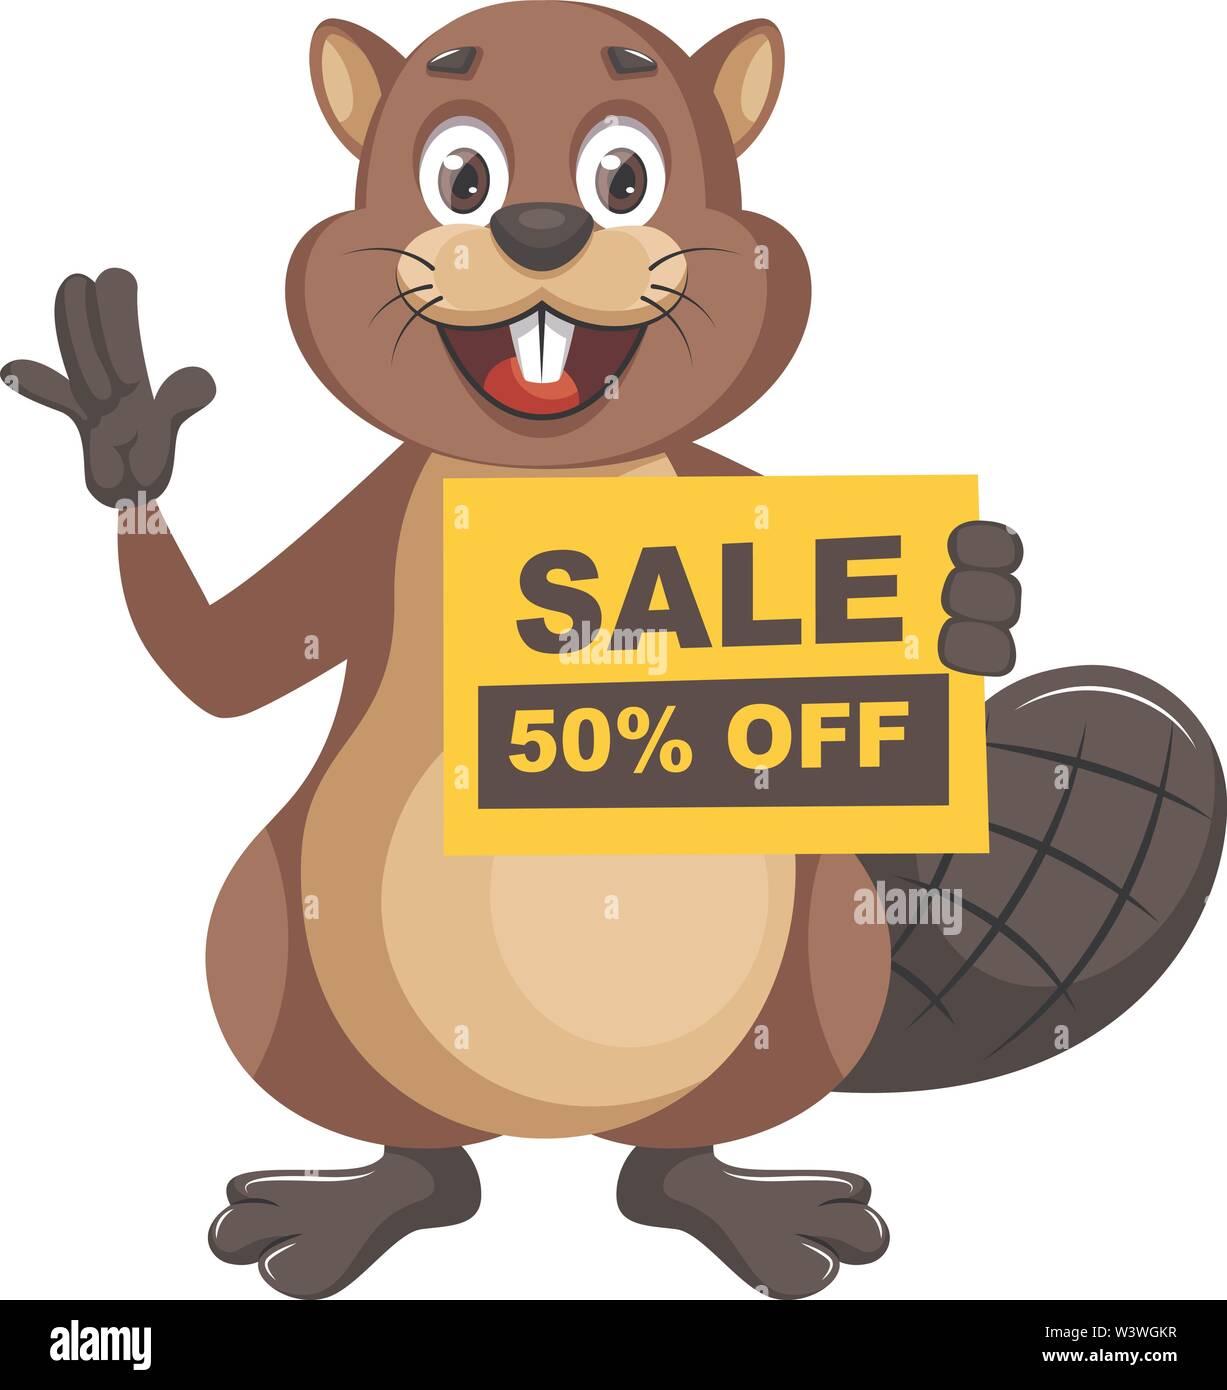 Beaver holding sale sign, illustration, vector on white background. - Stock Image